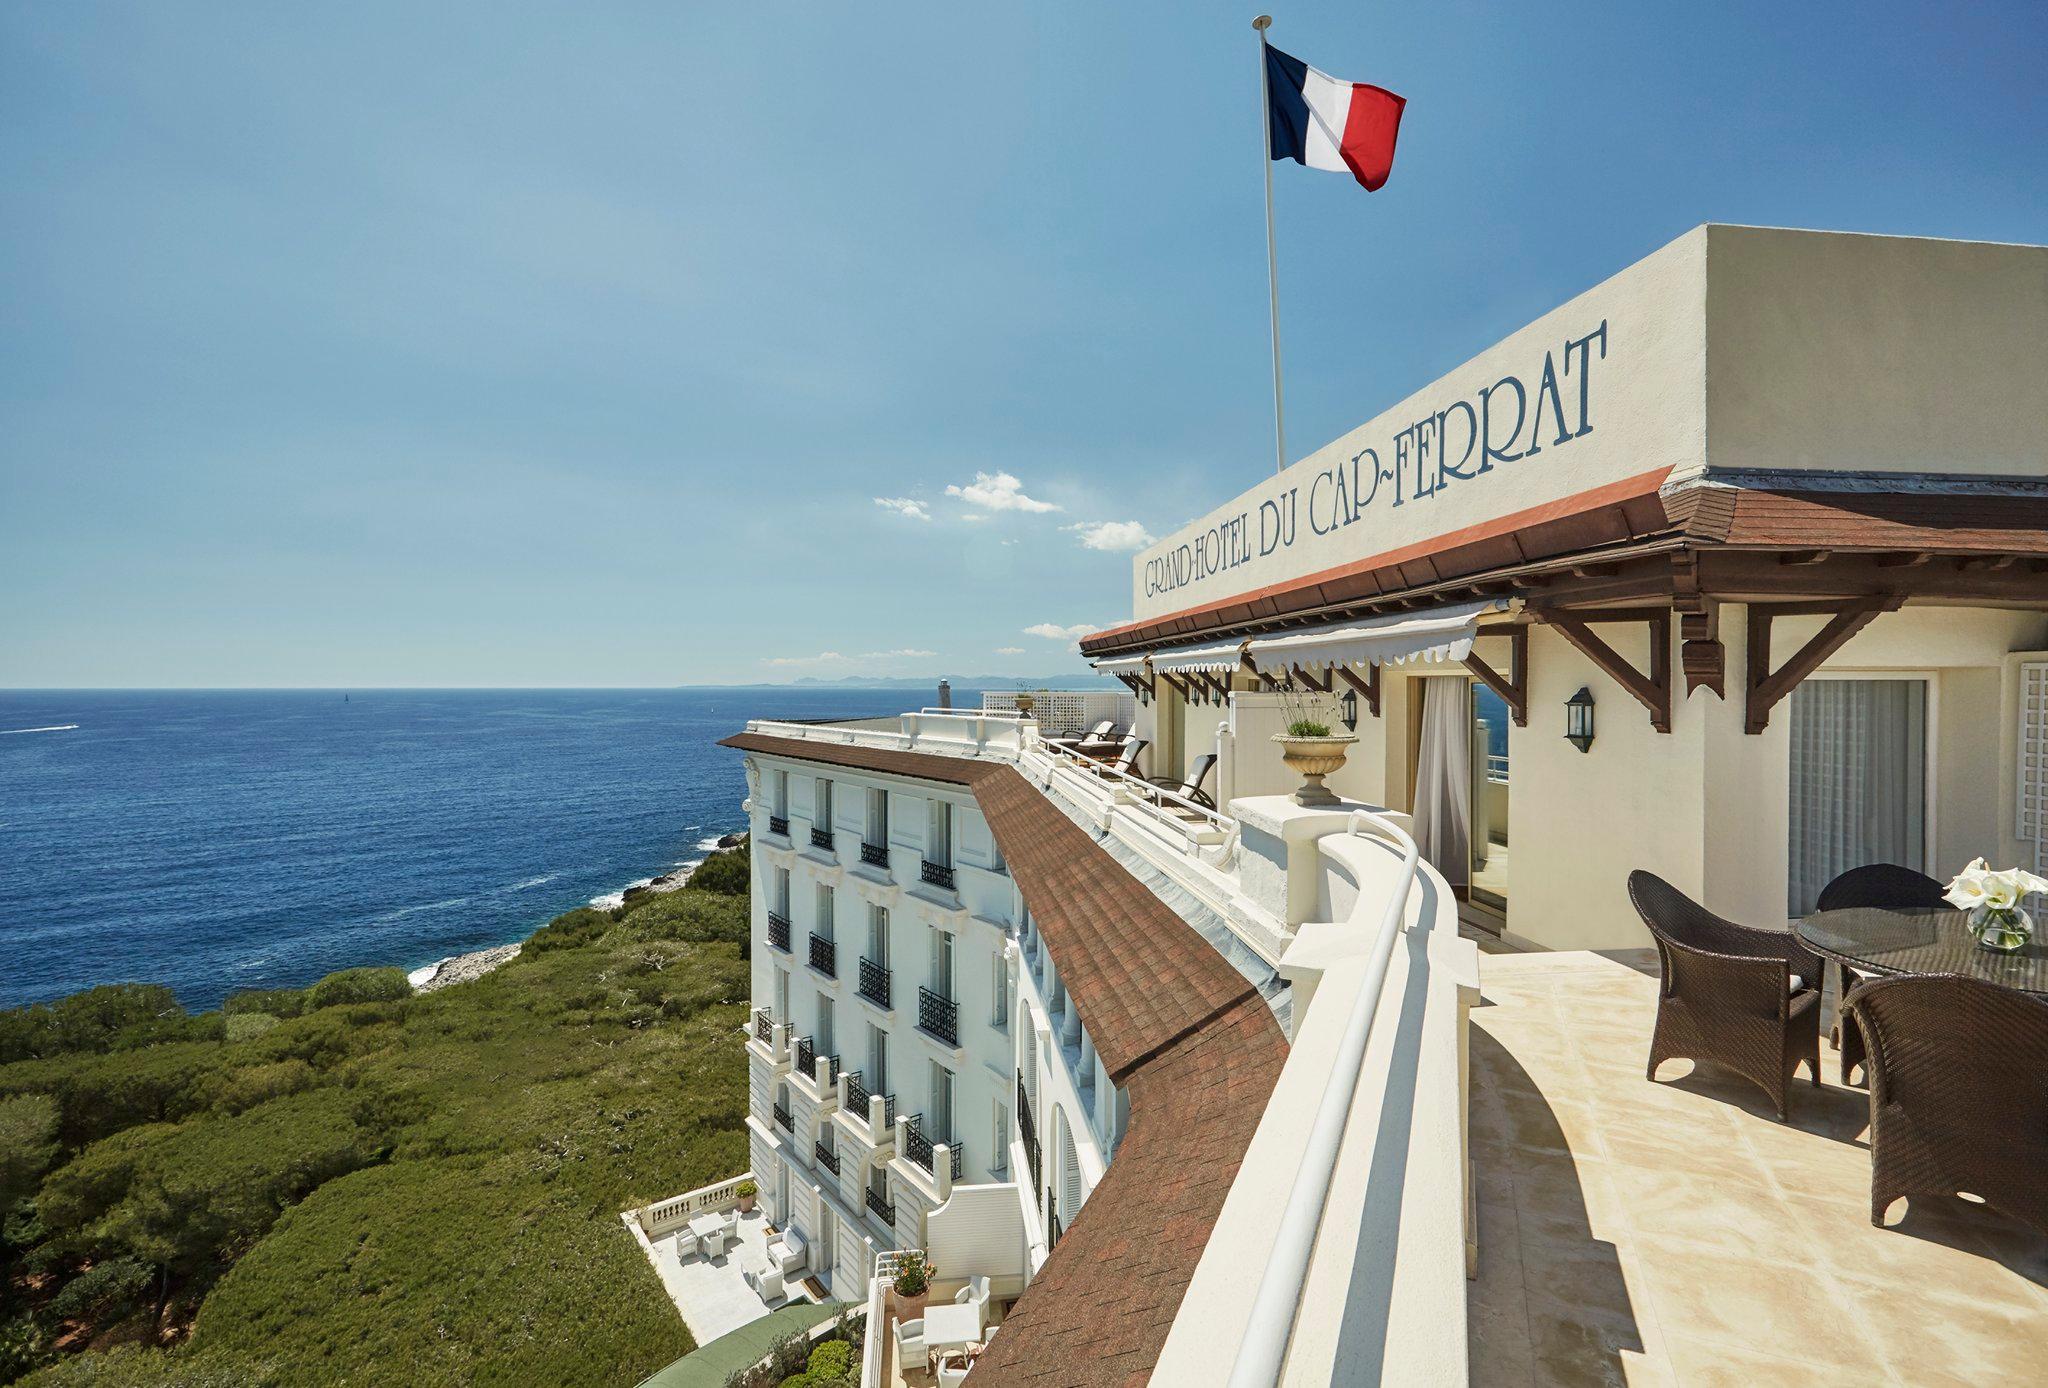 Grand Hotel Du Cap Ferrat A Four Seasons Hotel Saint Jean Cap Ferrat Alpes Maritimes Frankreich Die Gunstigen Angebote